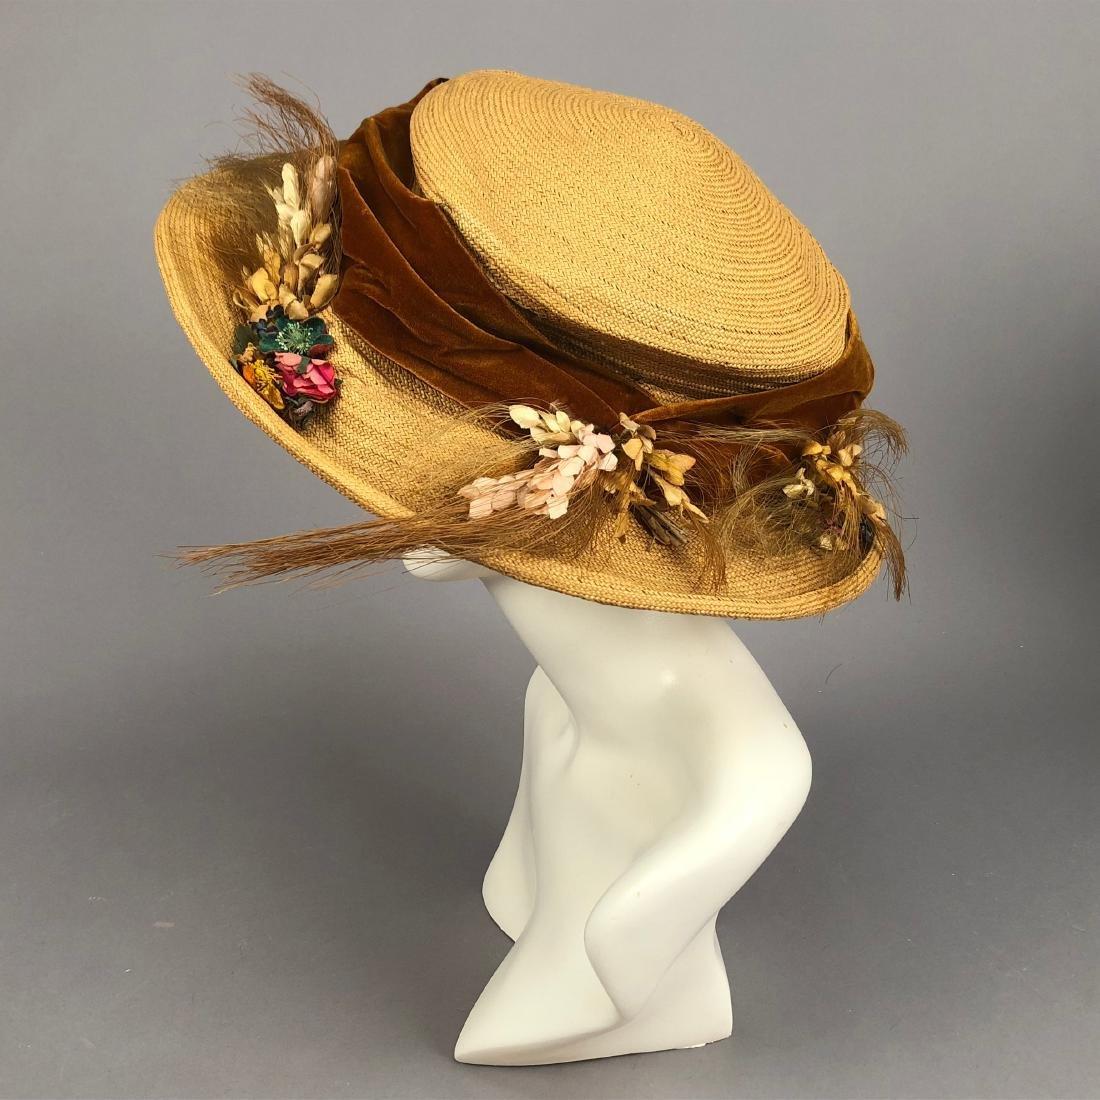 TWO WIDE-BRIM STRAW HATS, 1905 - 1915 - 5